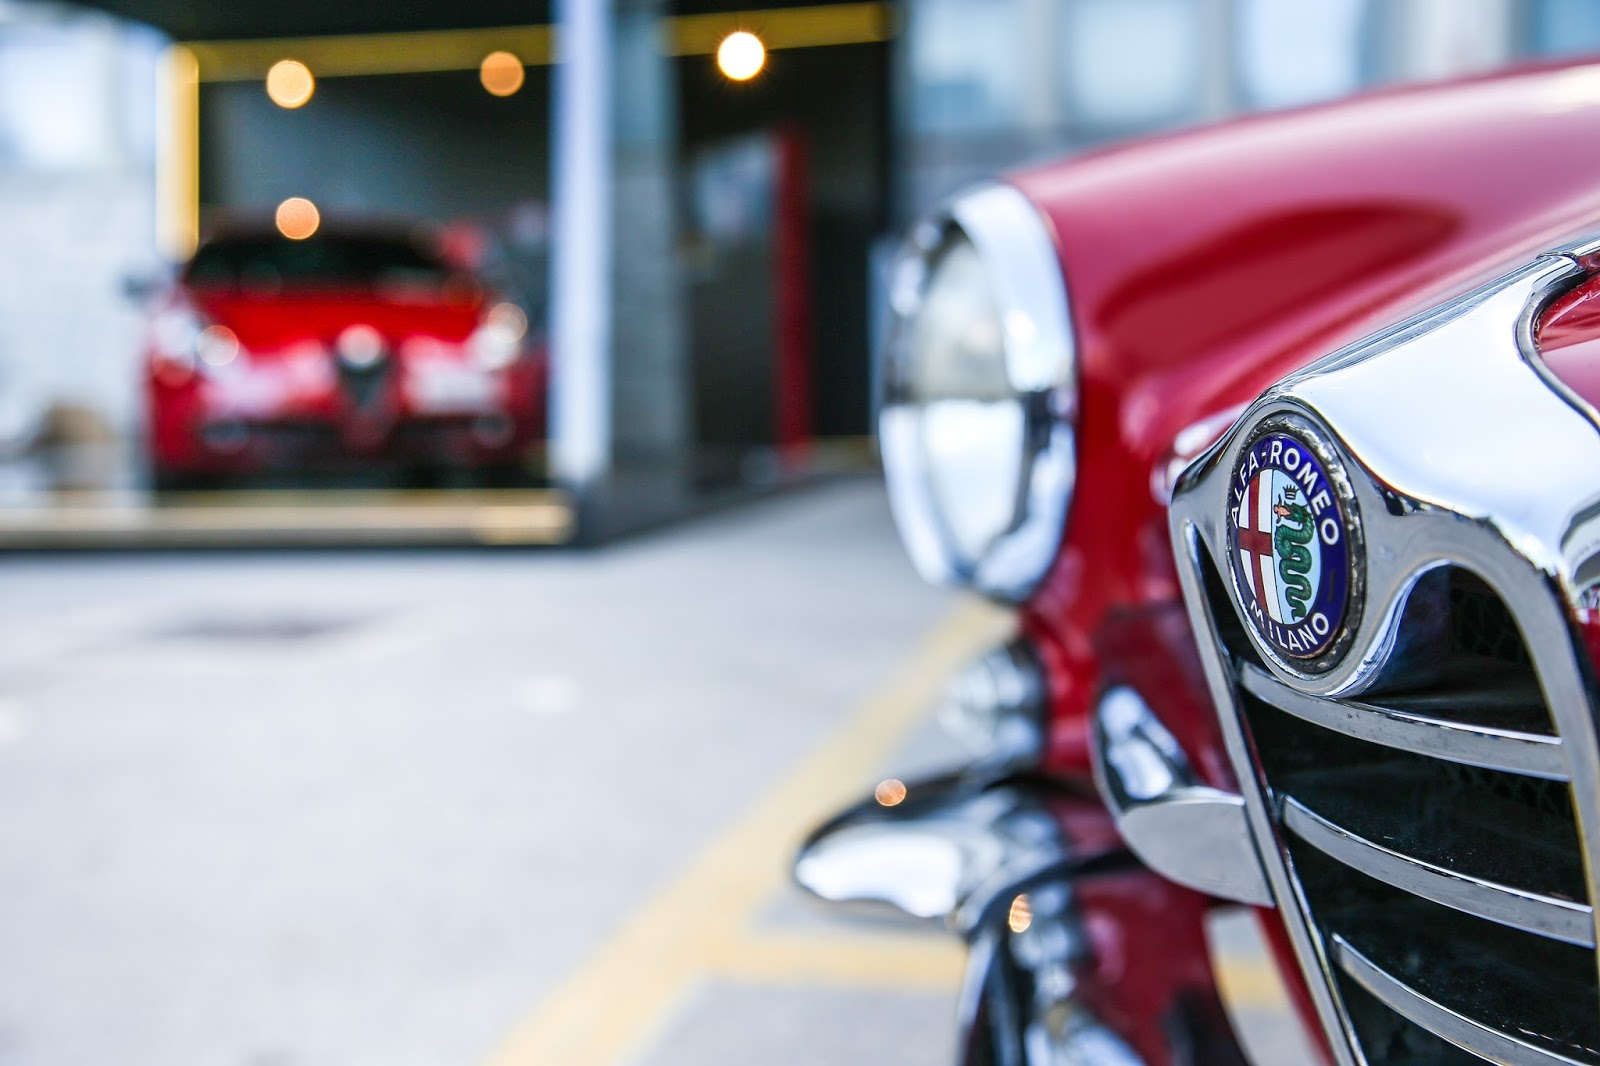 170420 Alfa Romeo On Air 06 H 1960 Giulietta SZ στο 101ο Targa Florio Alfa, alfa romeo, Alfa Romeo Giulietta, Alfa Romeo Giulietta SZ, Classic, Targa Florio, videos, αγωνες